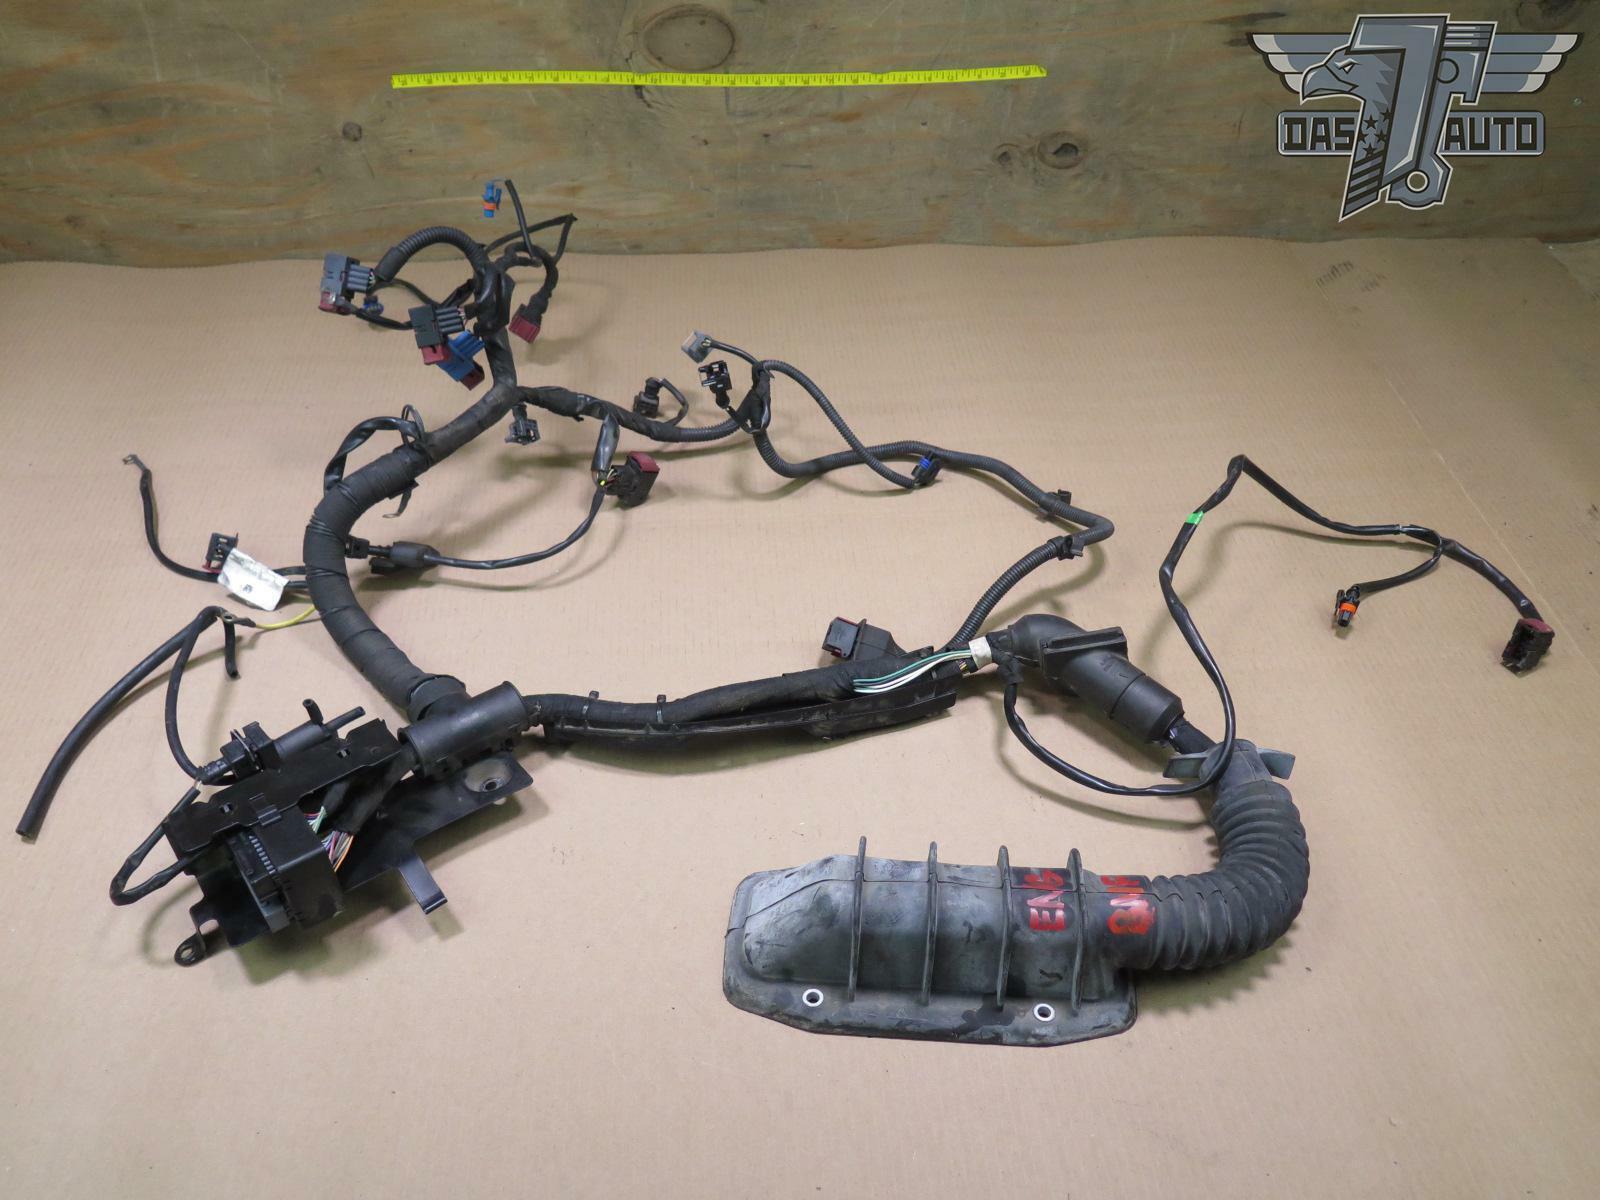 2009 saab 9-5 95 2.3l b235r engine wire wiring harness 12765992 oem   ebay  ebay